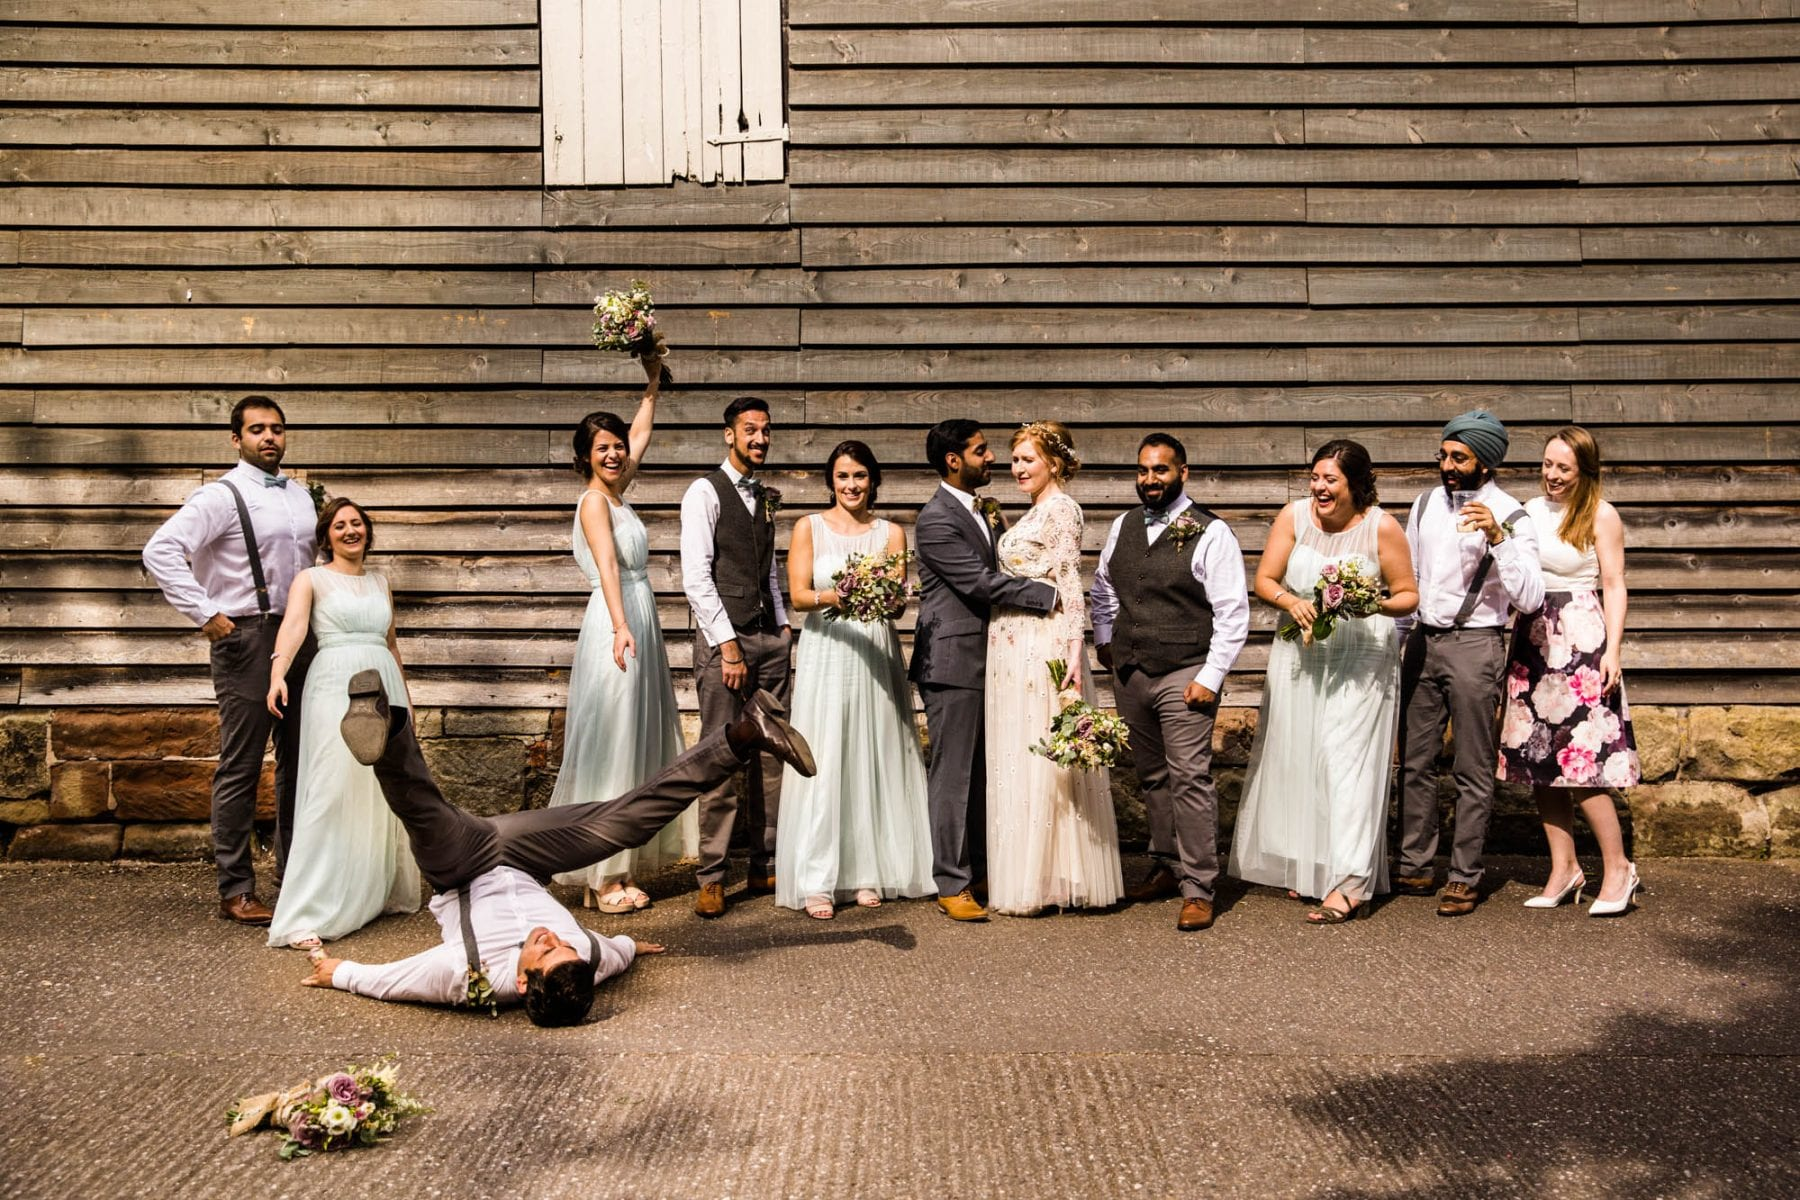 Pimhill Barn Fun Wedding Photographs